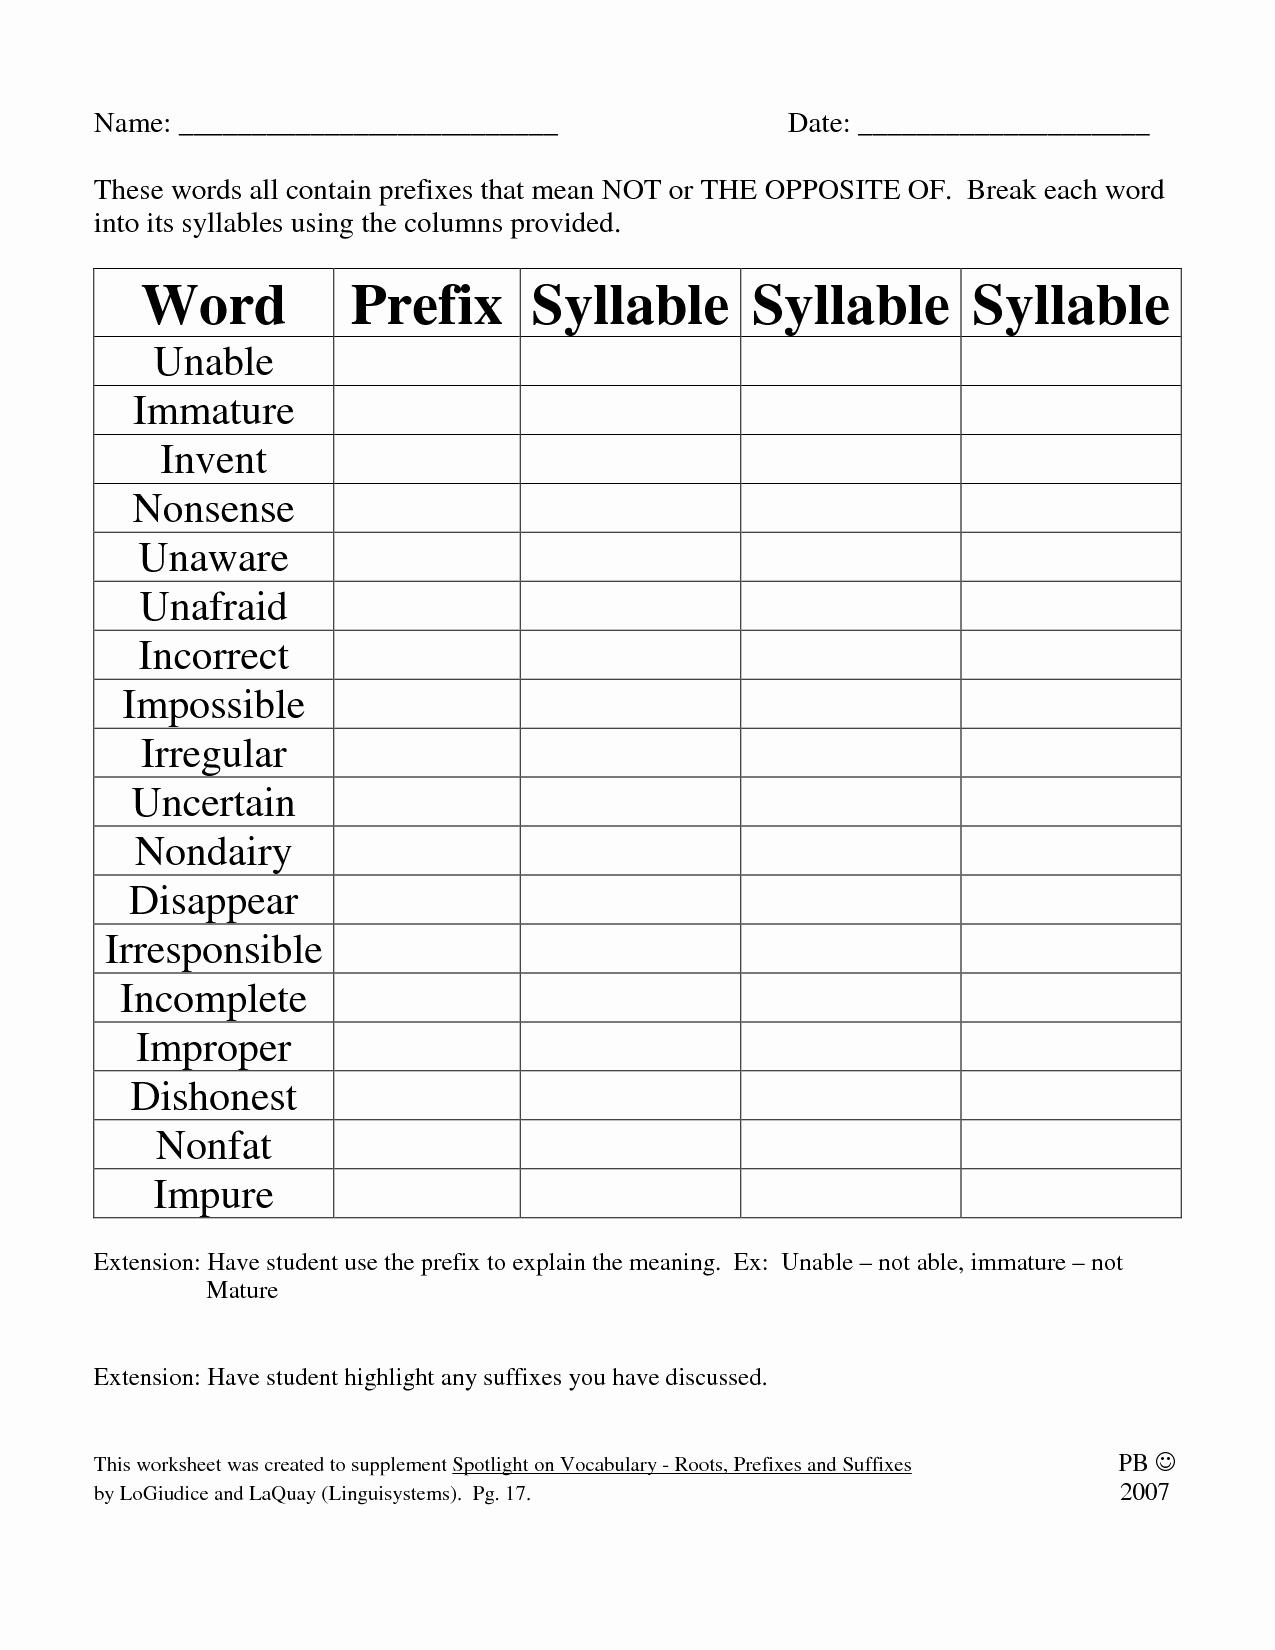 Medical Terminology Suffixes Worksheet Elegant Medical Terminology Root Words Worksheets the Best